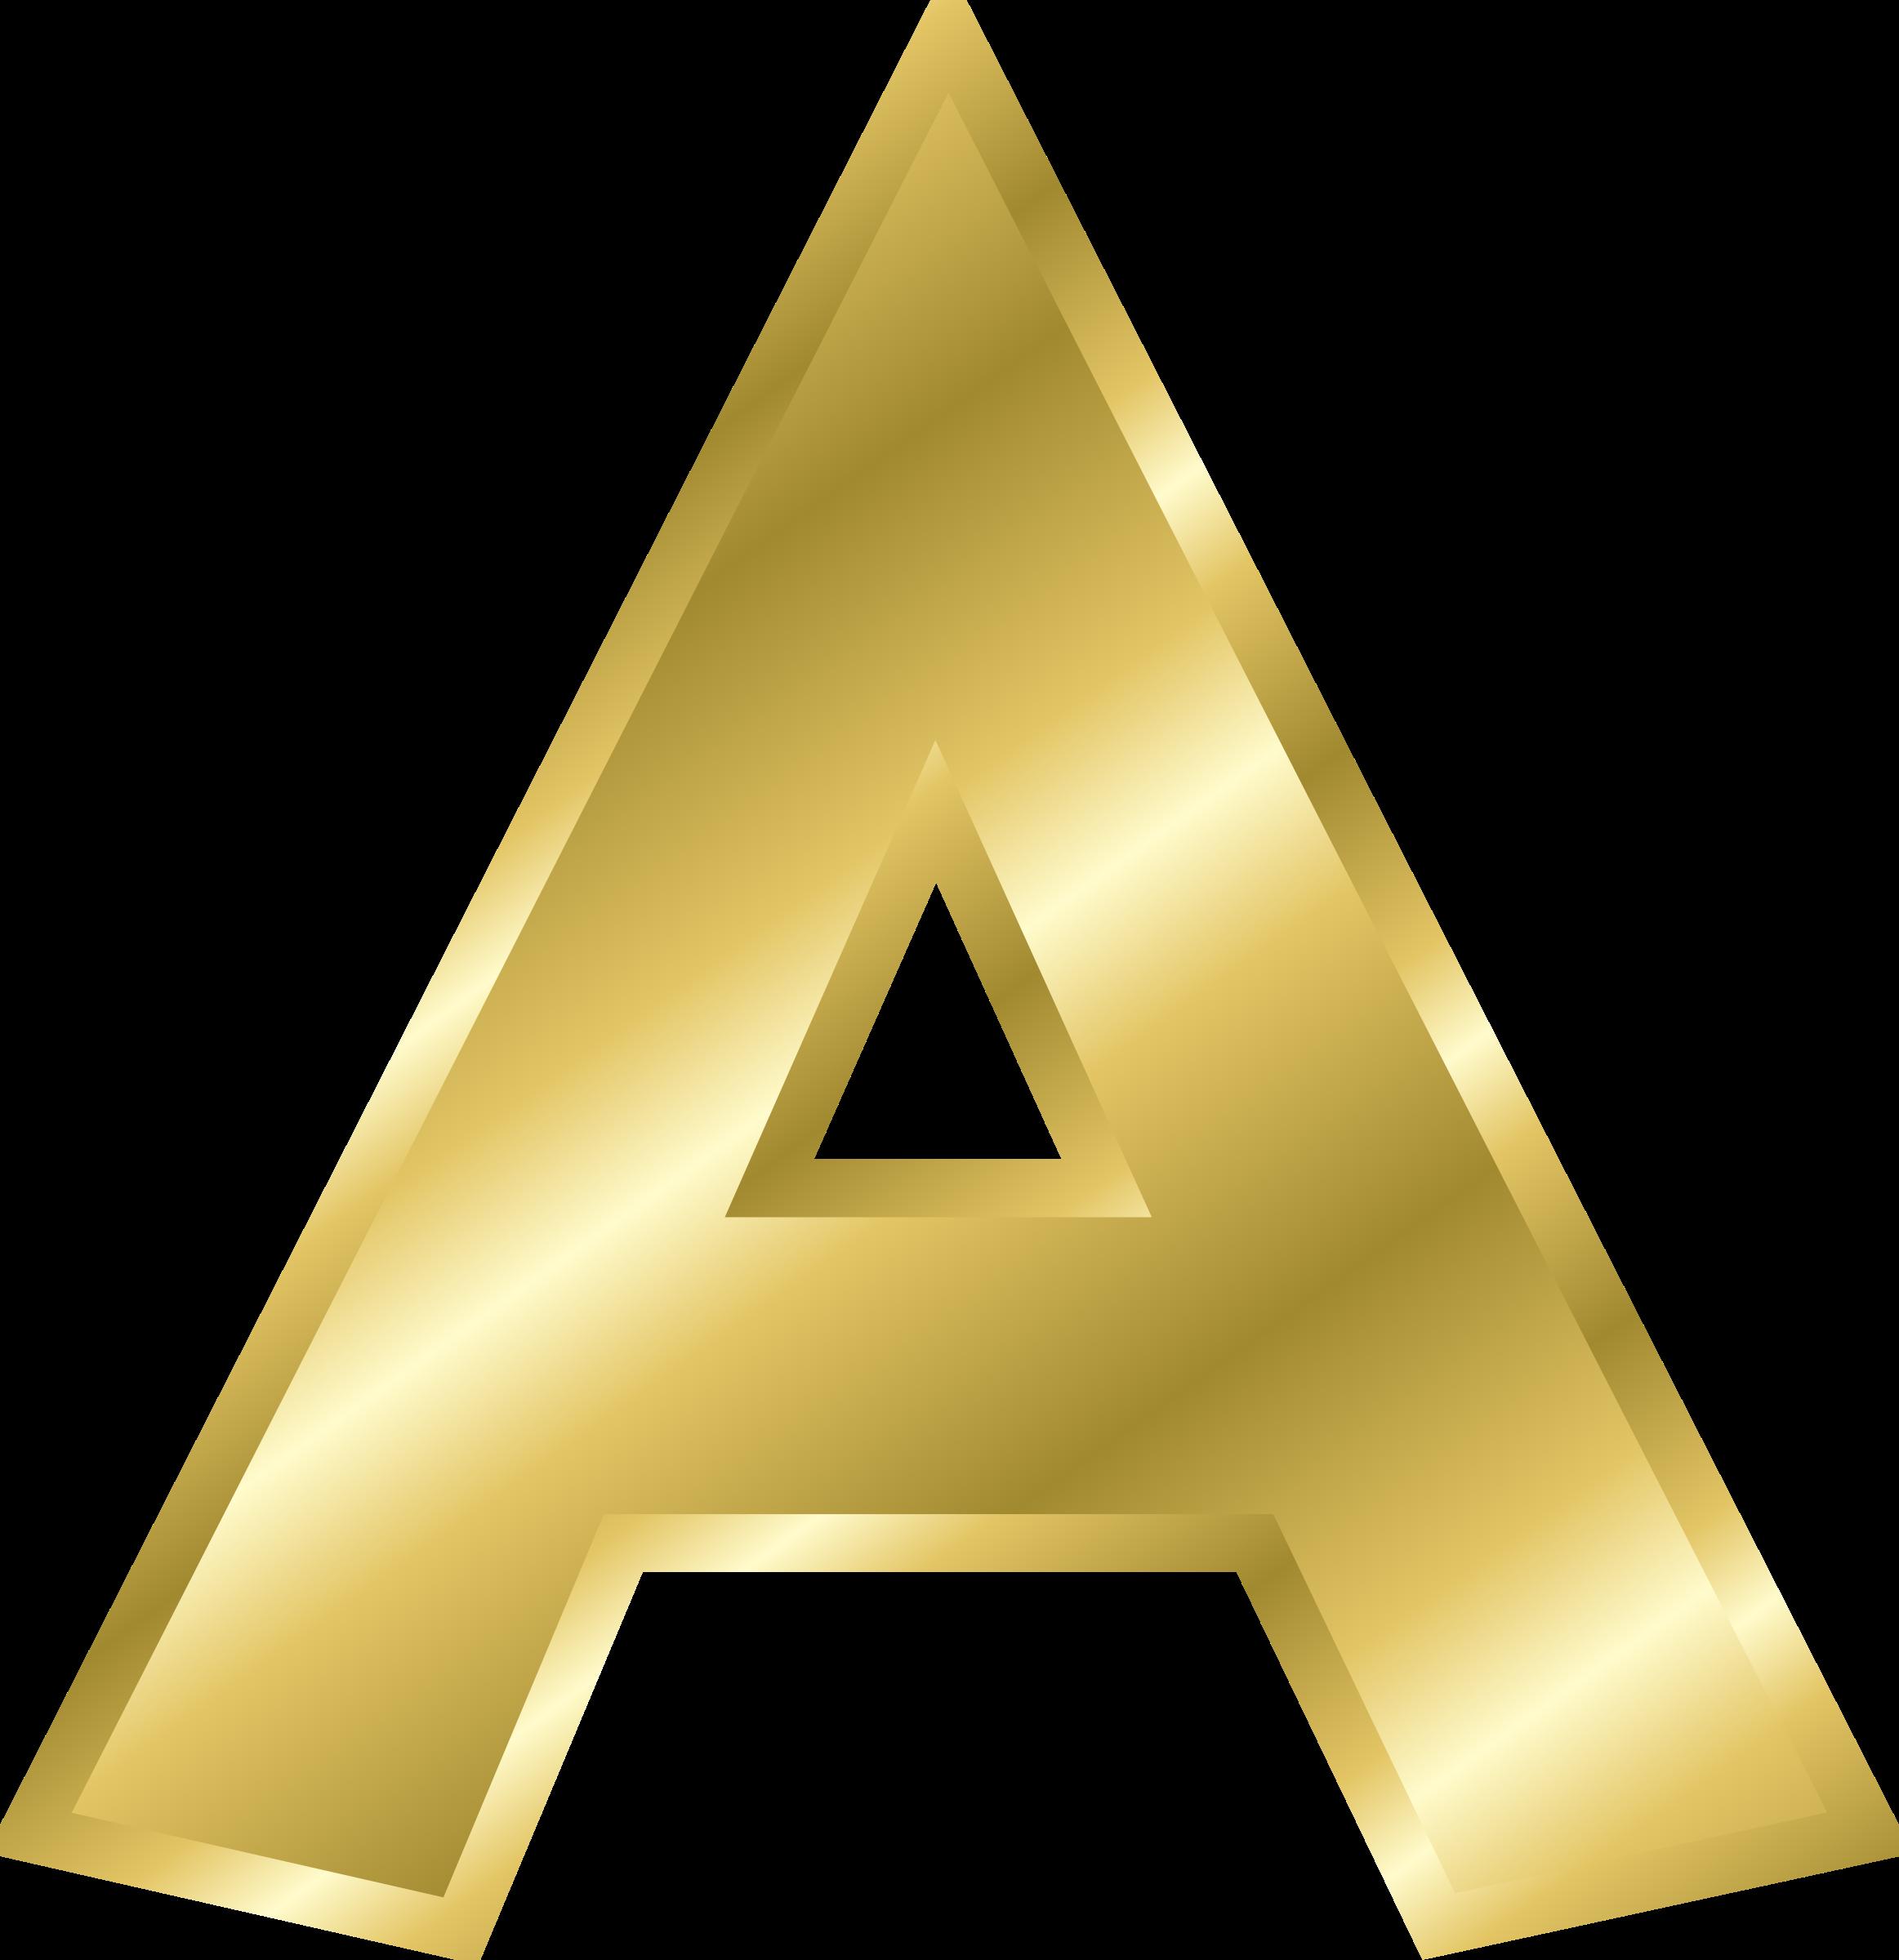 Letter clipart alphabet banner transparent stock Clipart - Effect Letters alphabet gold banner transparent stock